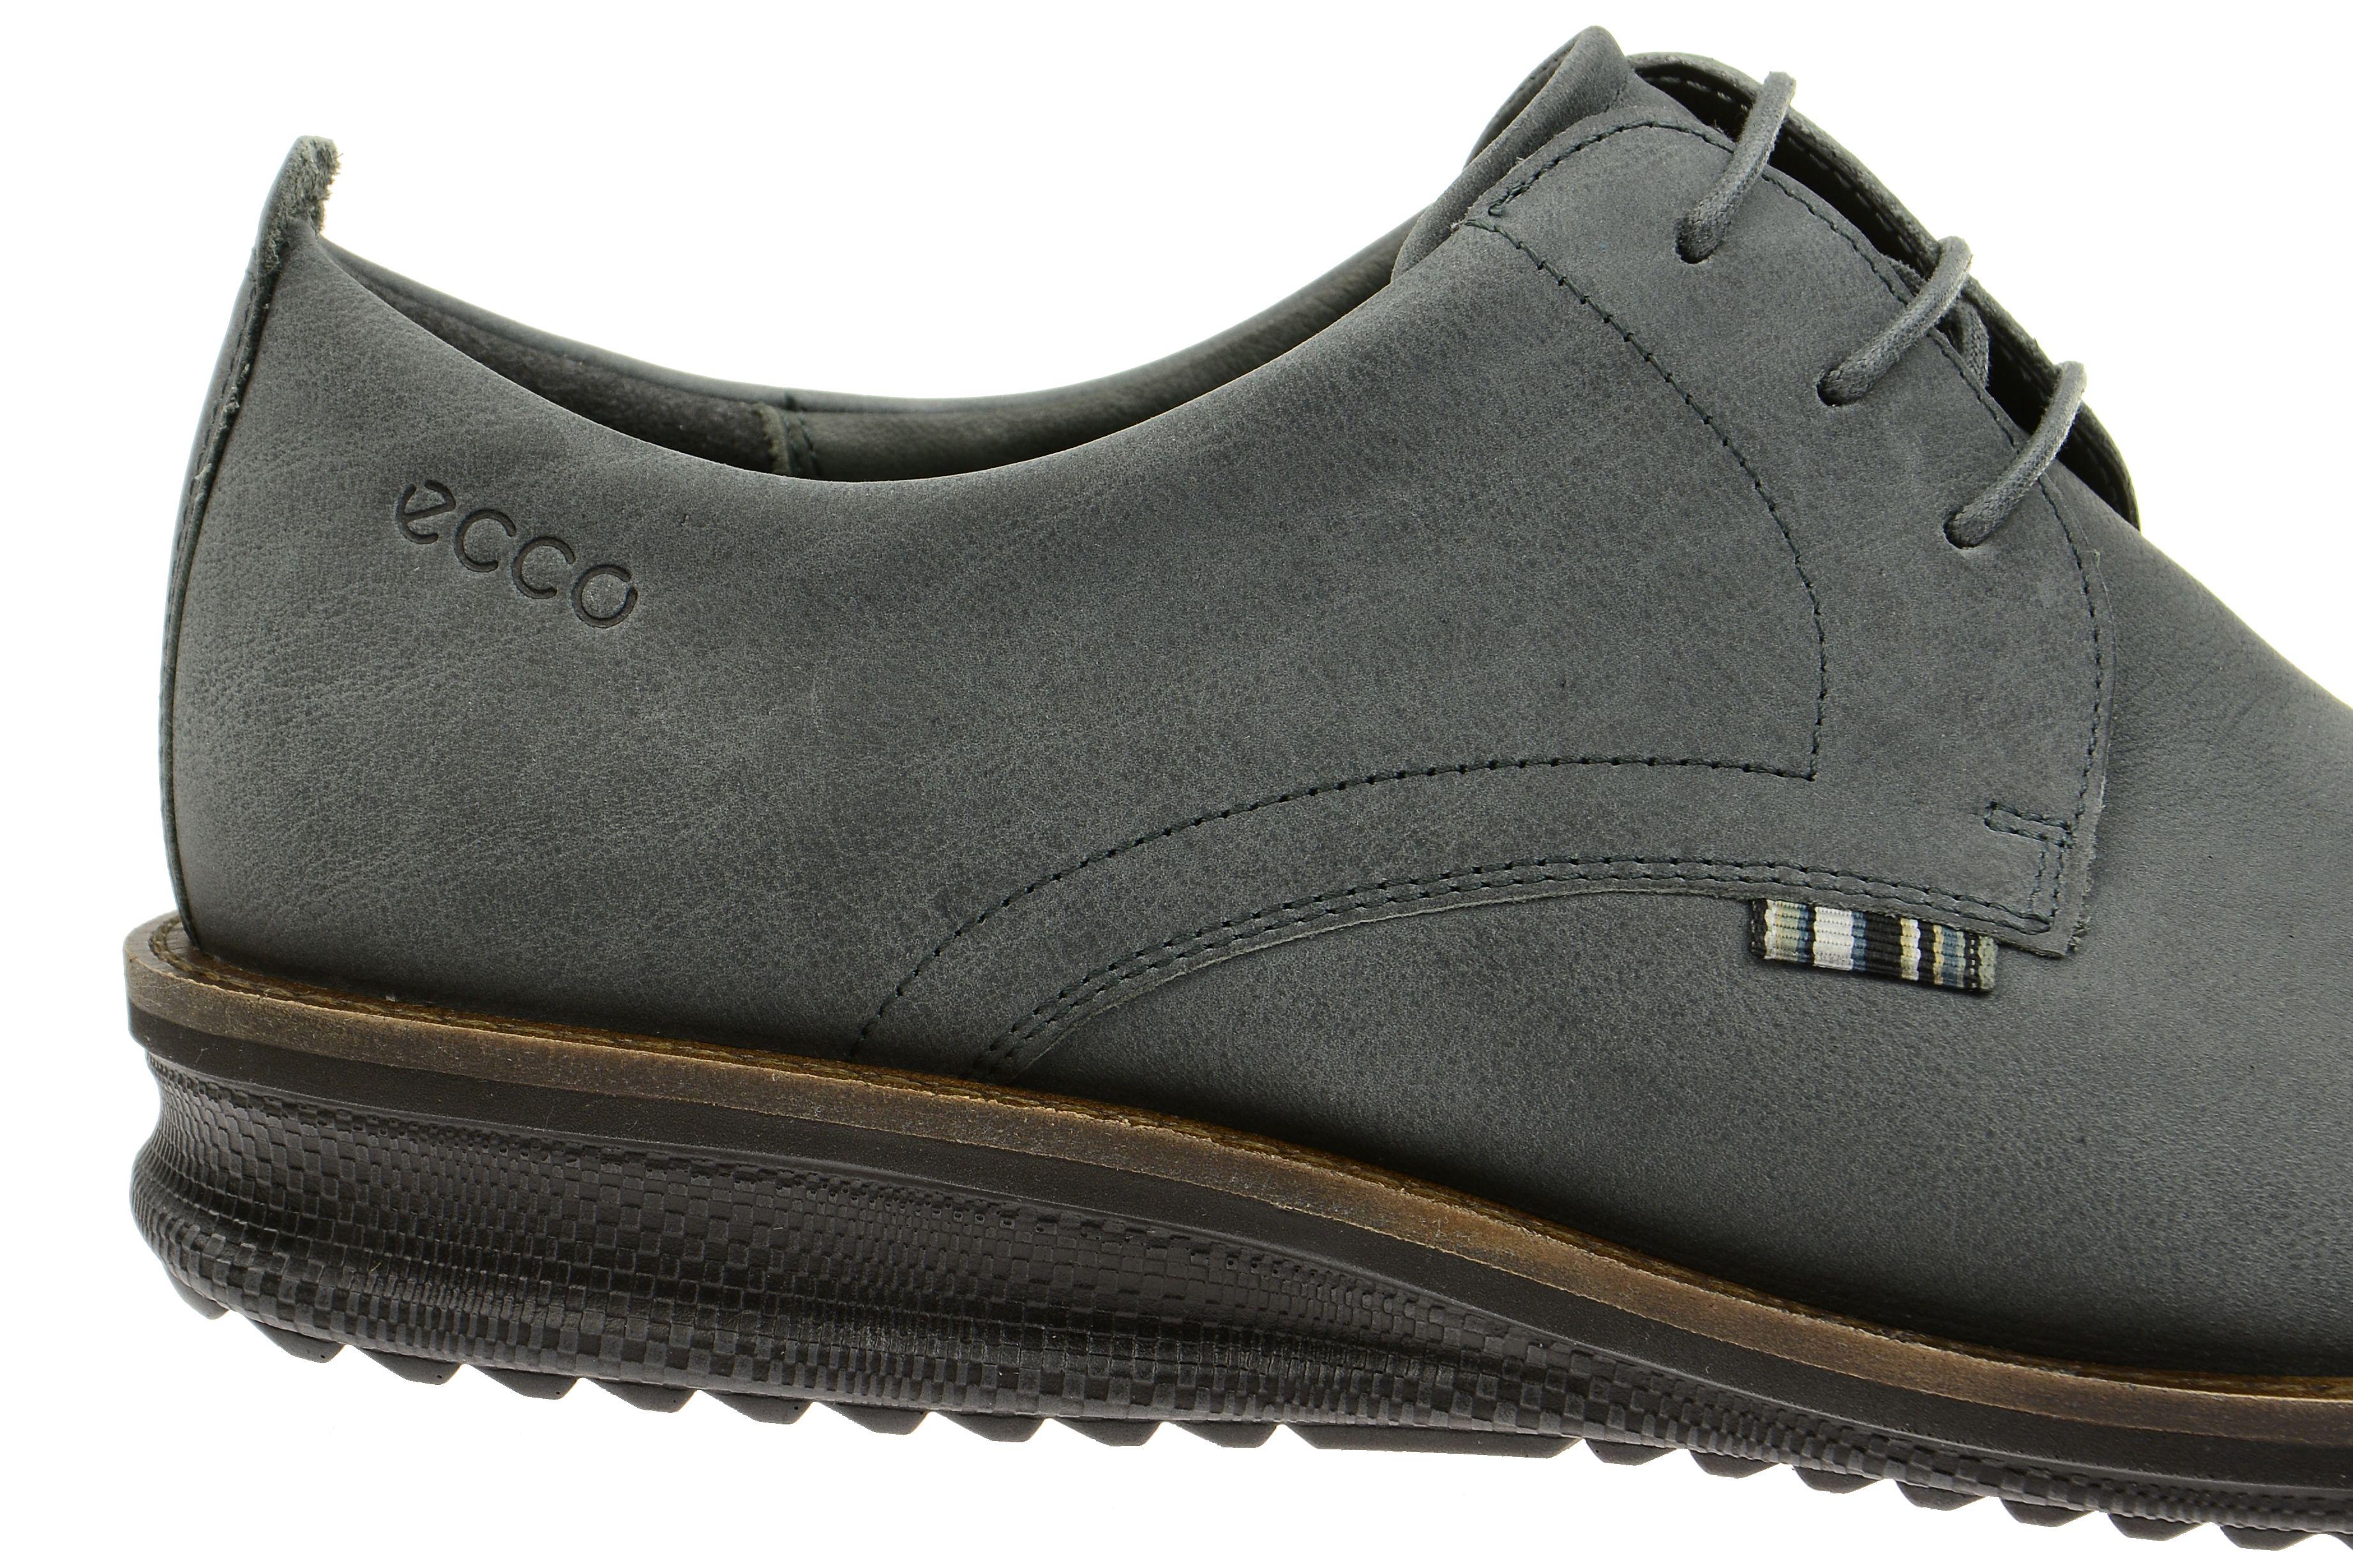 Ecco Contoured Schuhe grau nubuck | Schuhe online kaufen